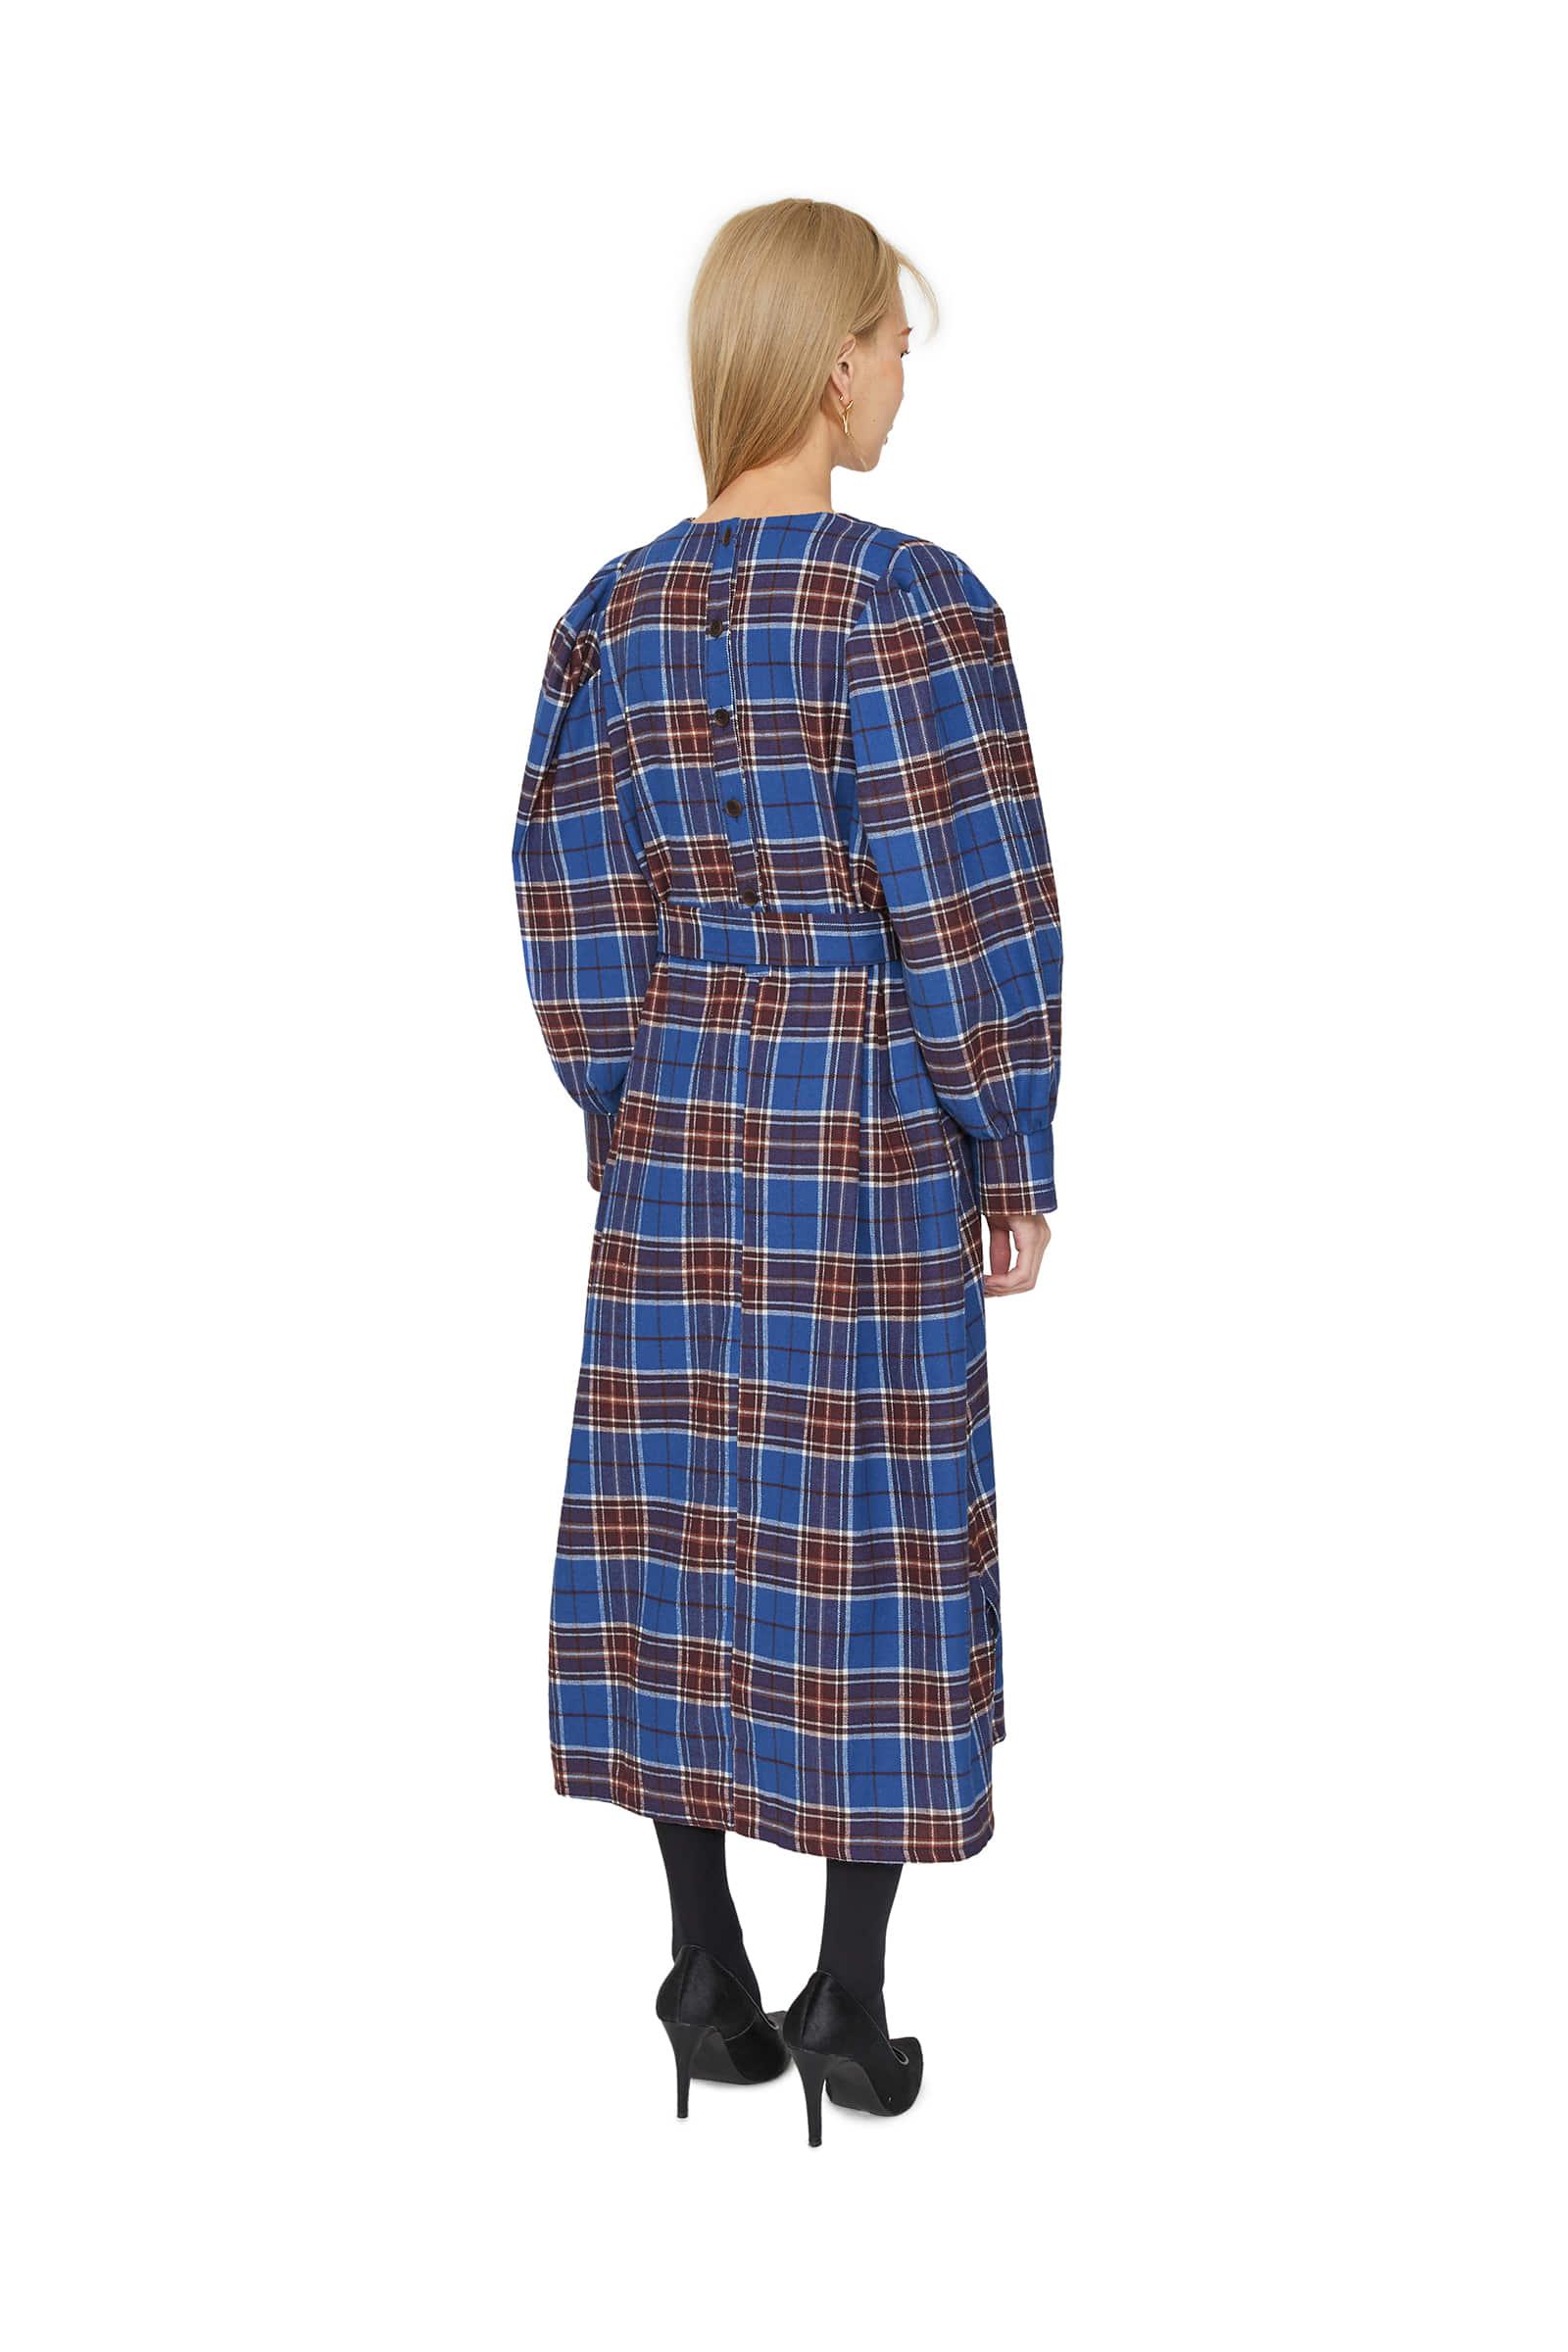 Trick check puff midi dress